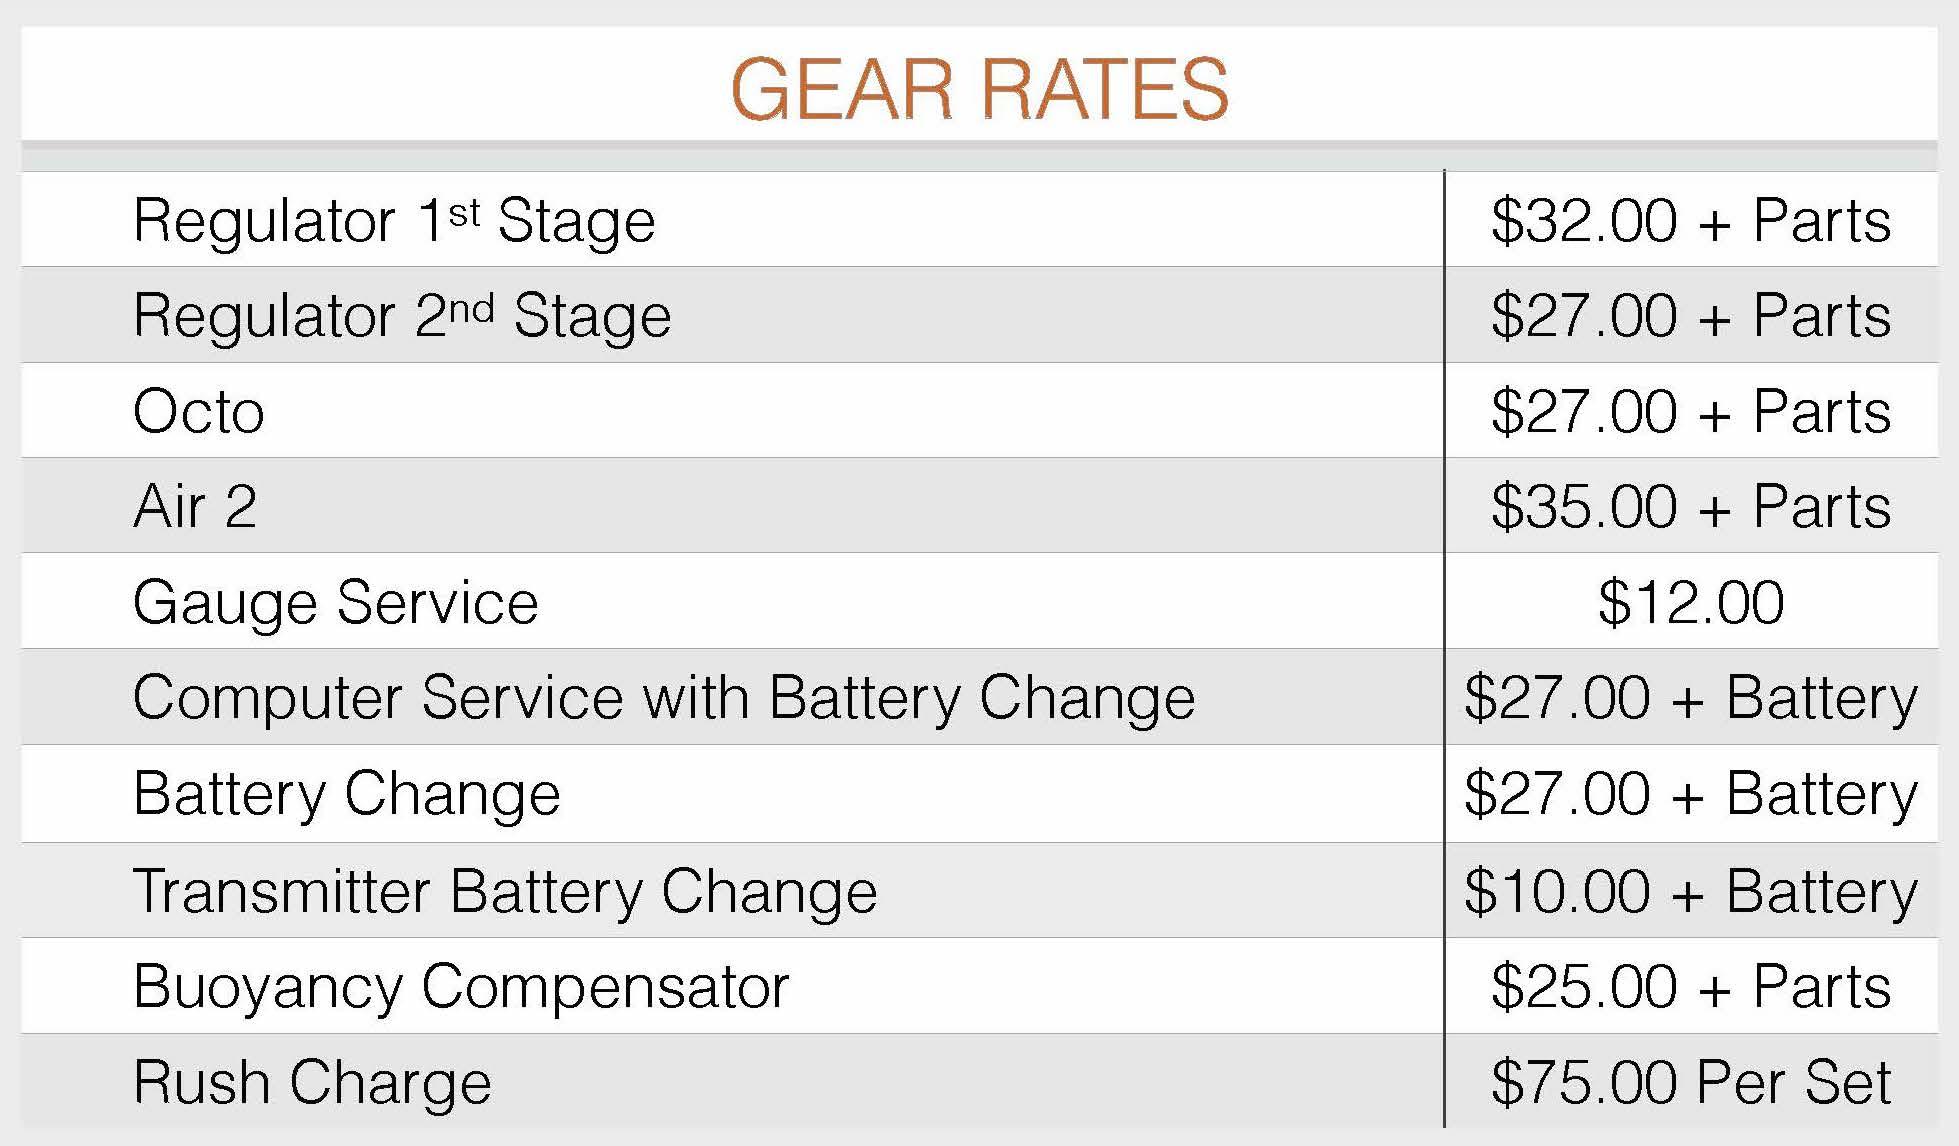 JDC Gear Rates final